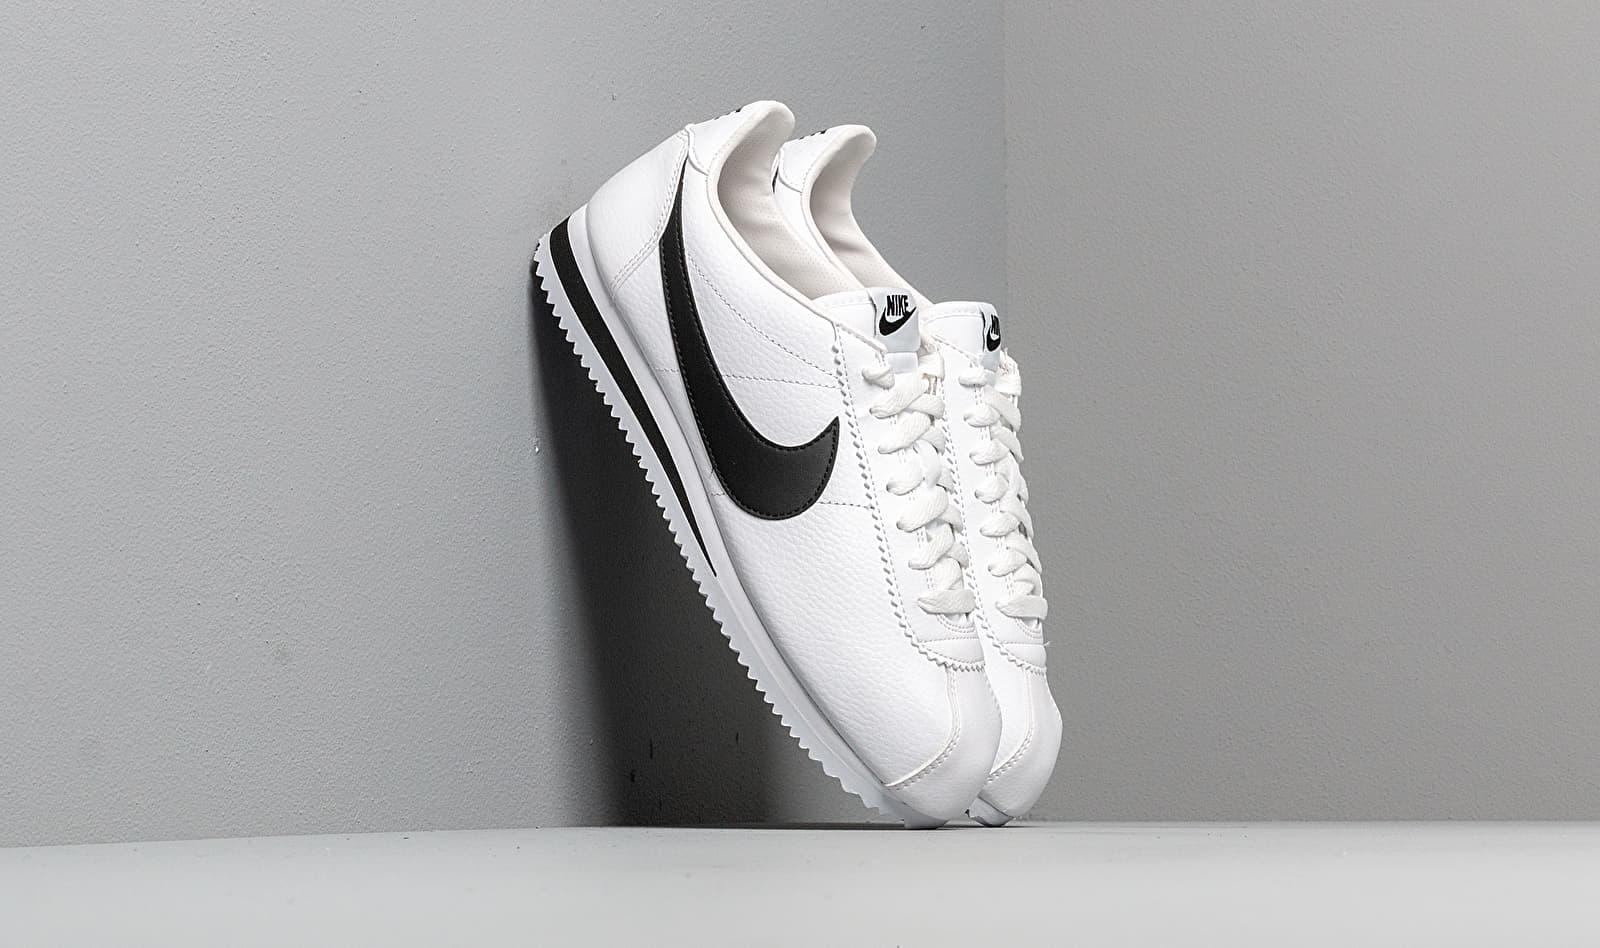 Nike Classic Cortez Leather White/ Black 749571-100